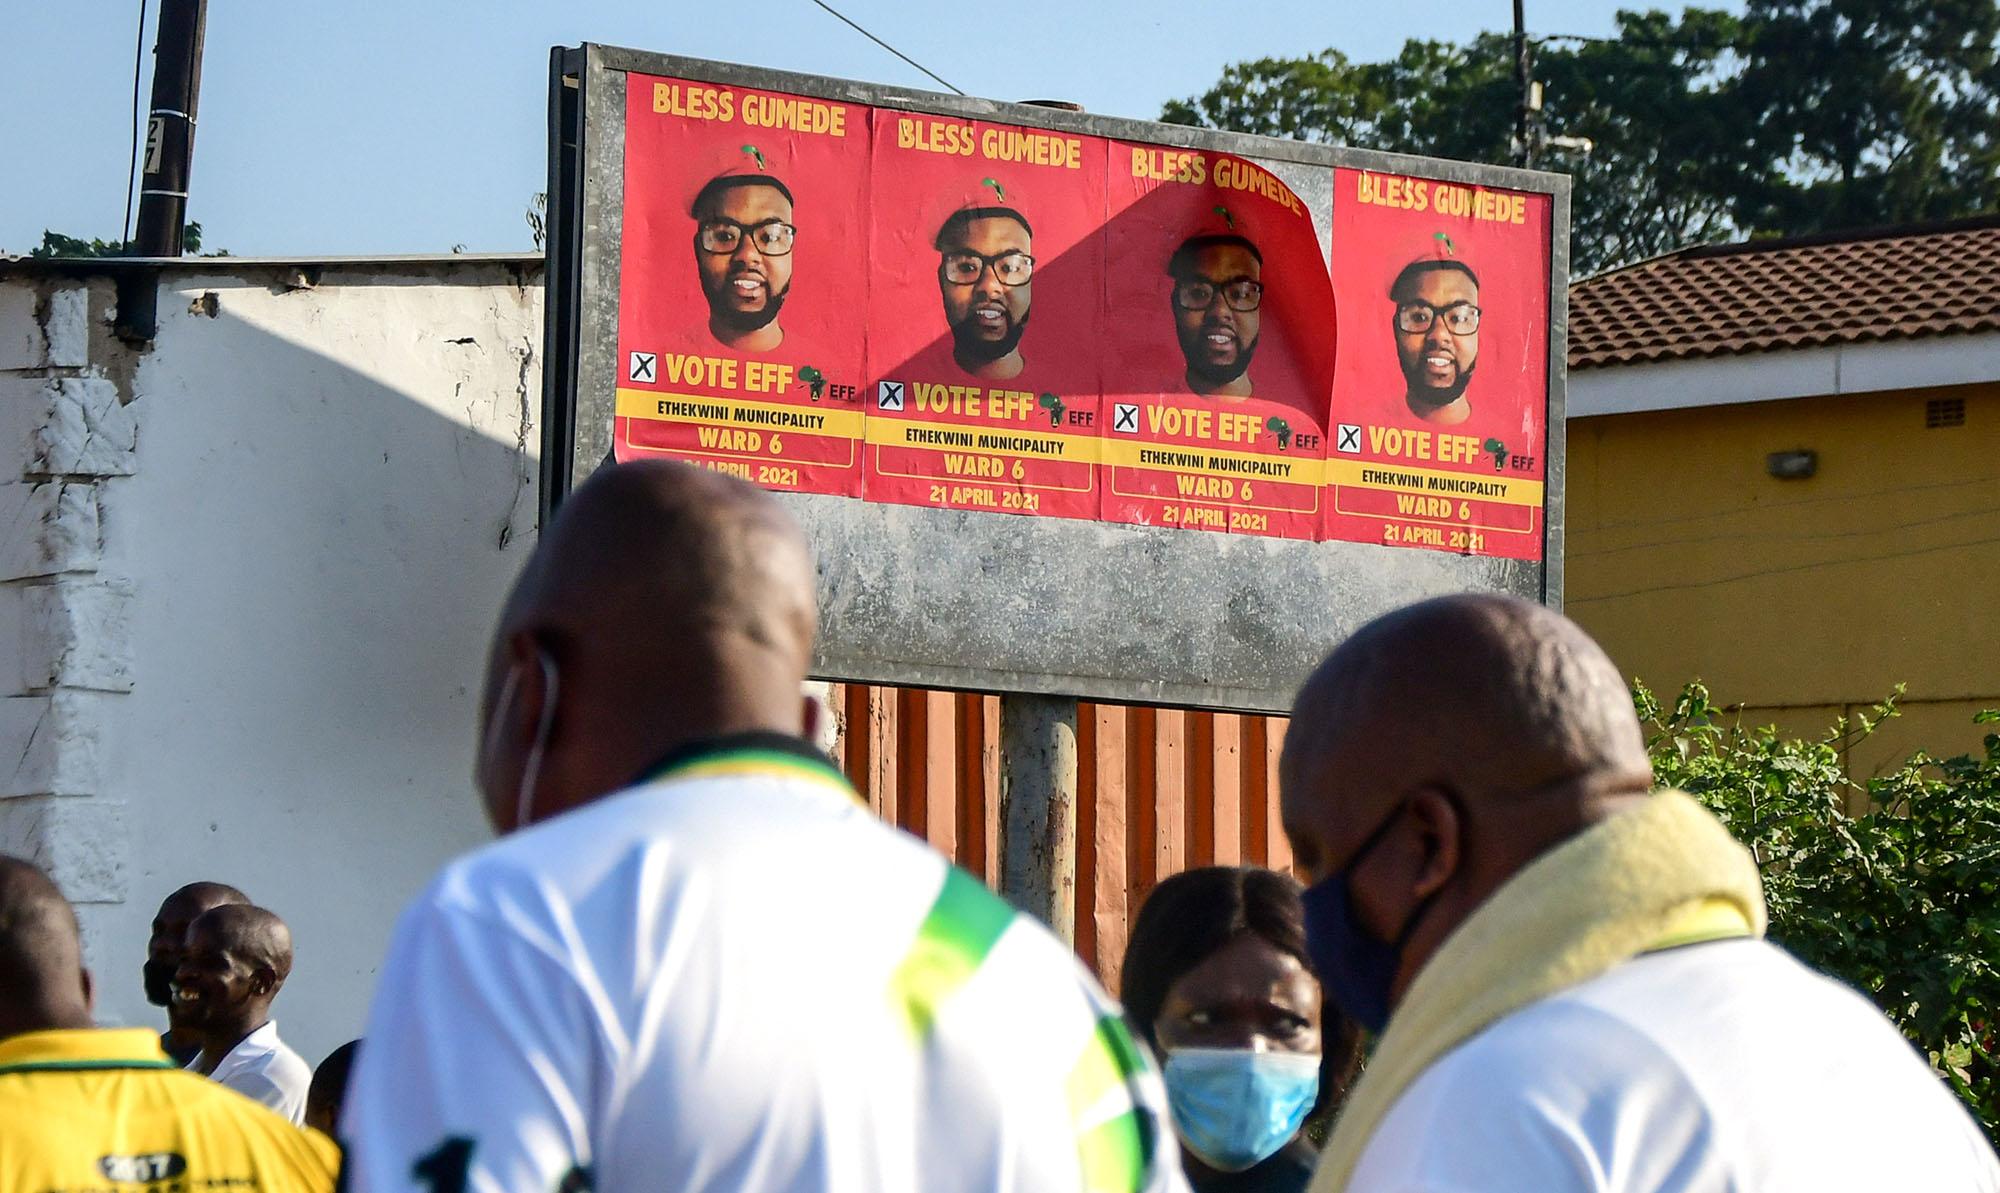 KwaZulu-Natal: ANC win rural KZN ward off IFP, while red berets make their mark in eThekwini - Daily Maverick